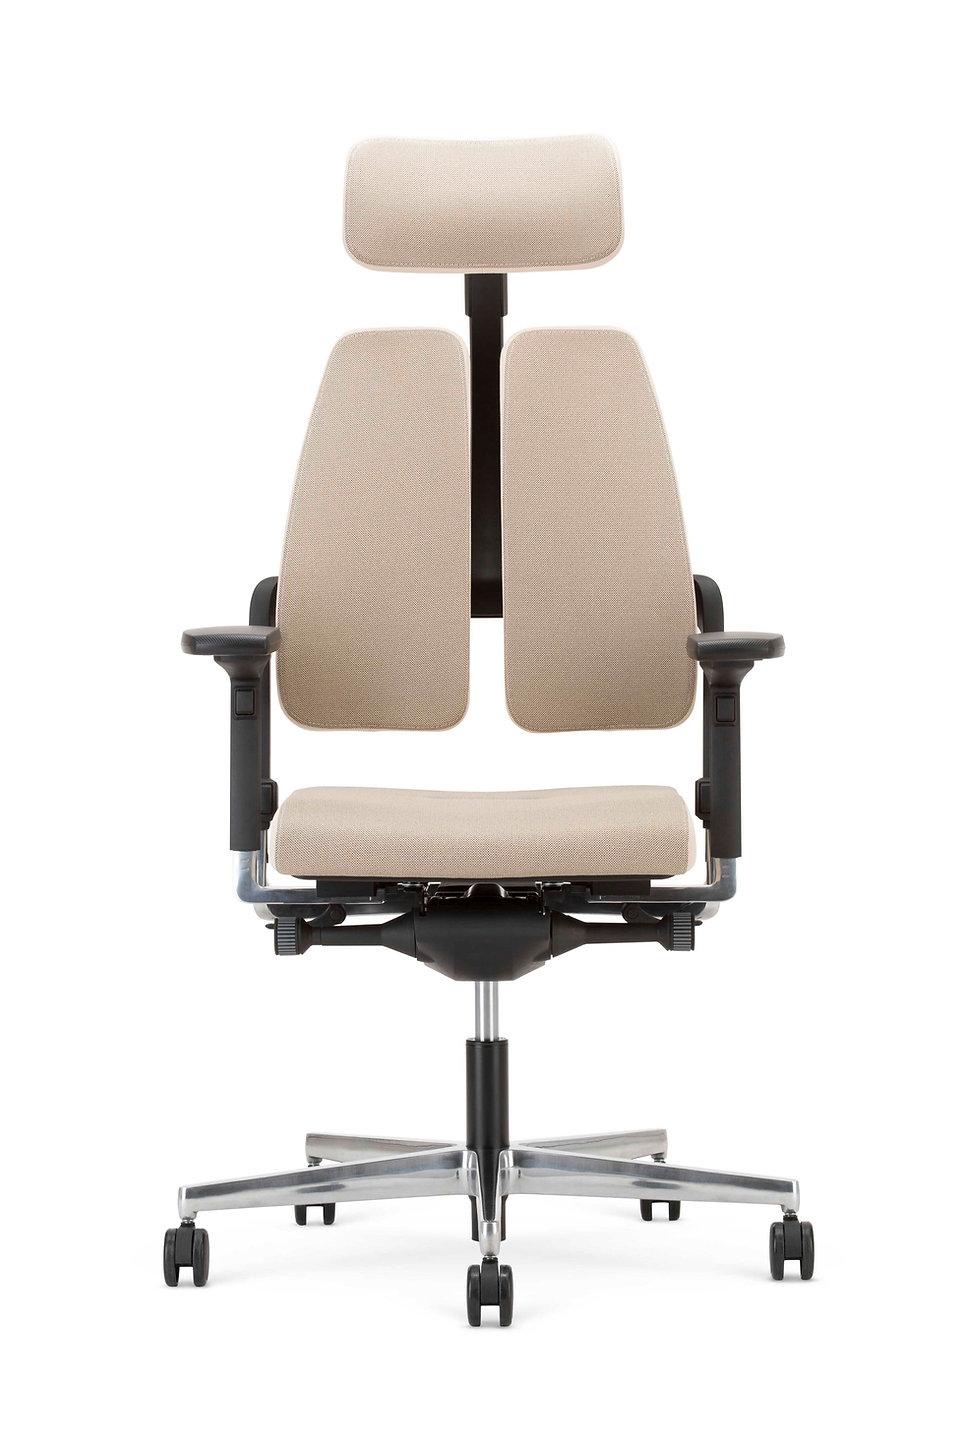 Xilium_DuoBack_office_chair_50%_2.jpg